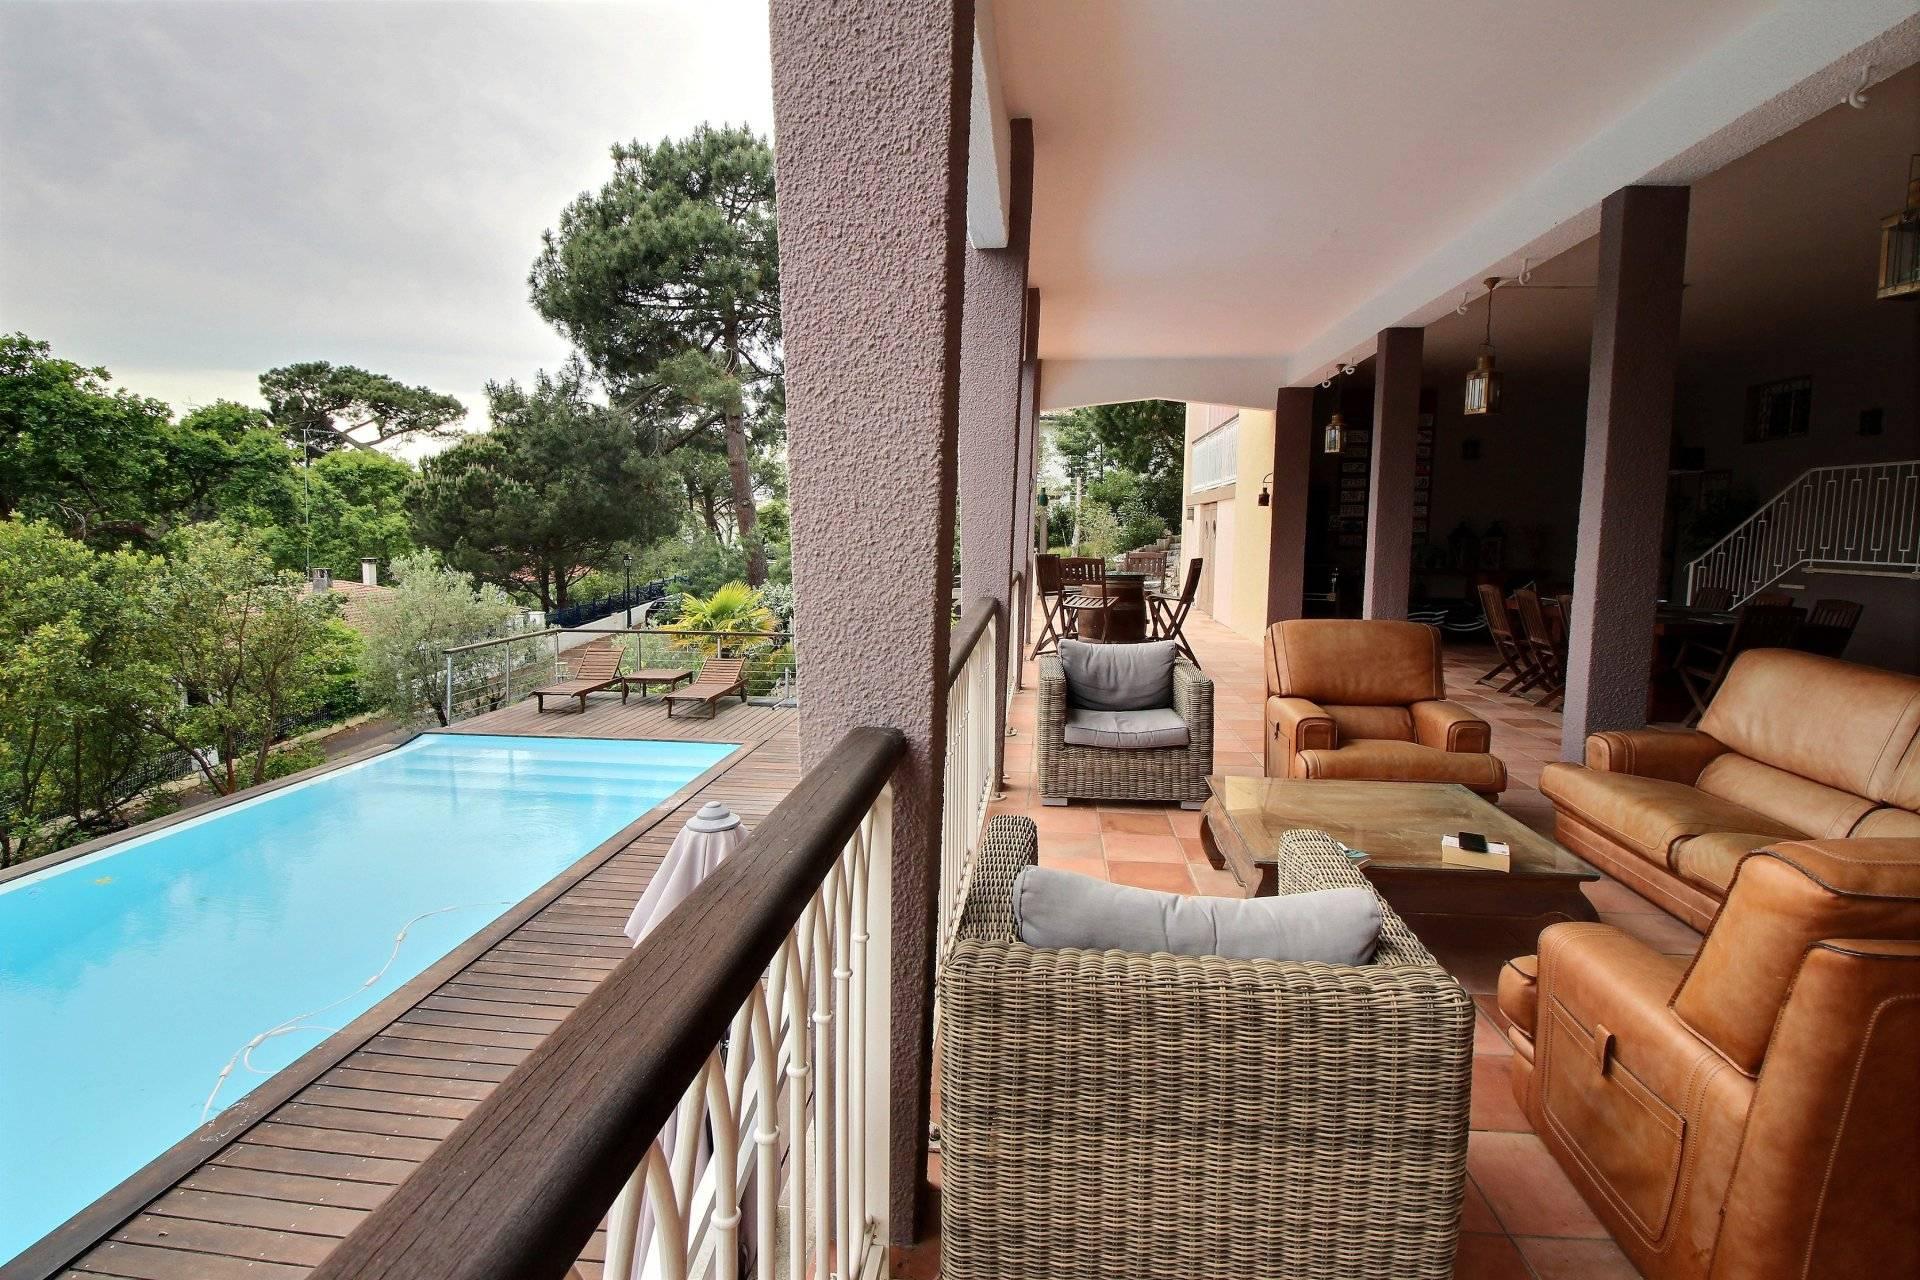 Vente villa de prestige avec vue panoramique quartier Pereire ARCACHON